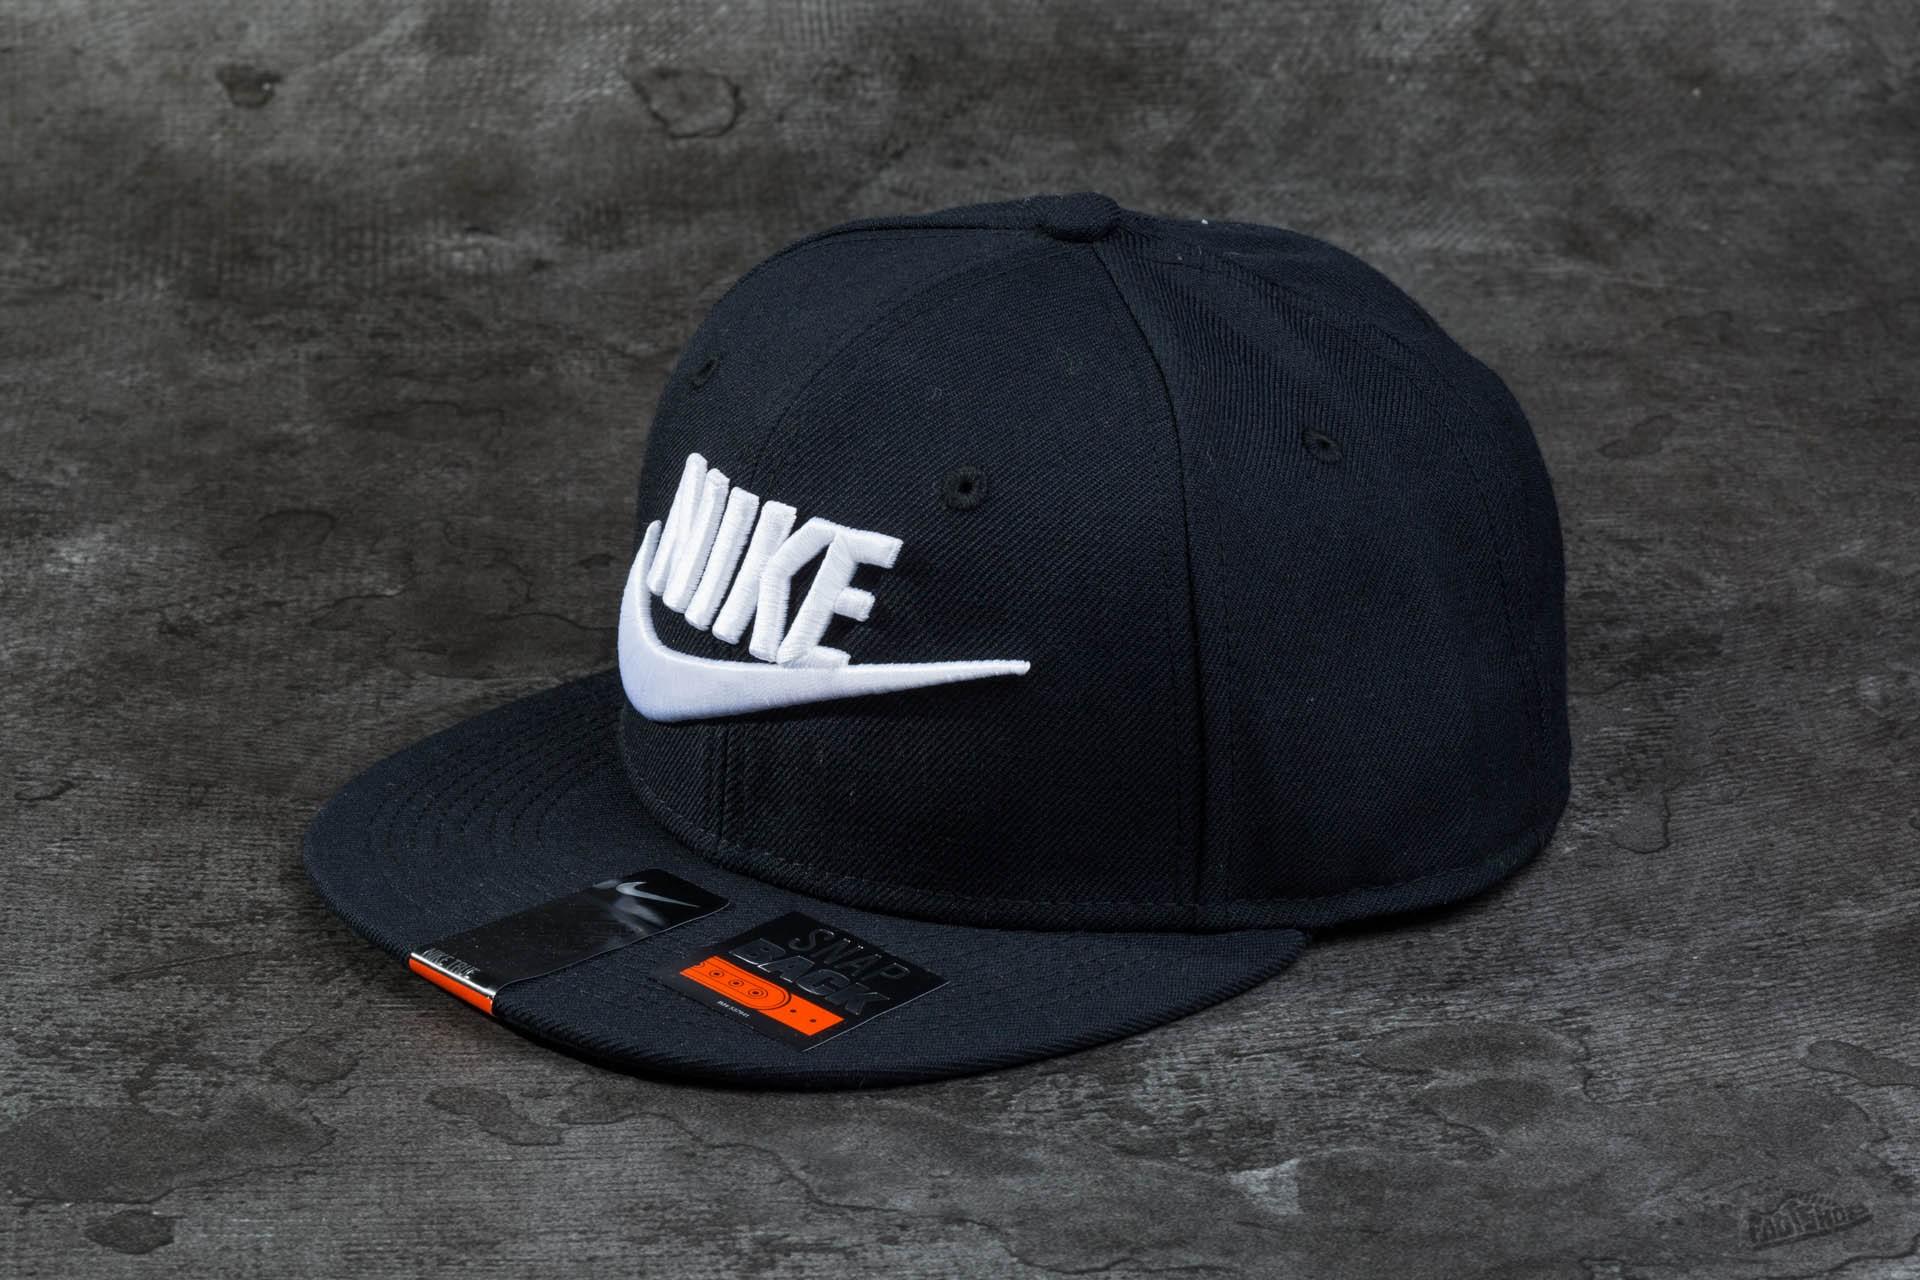 58d5a77c25d6c Nike Limitless True Snapback Black